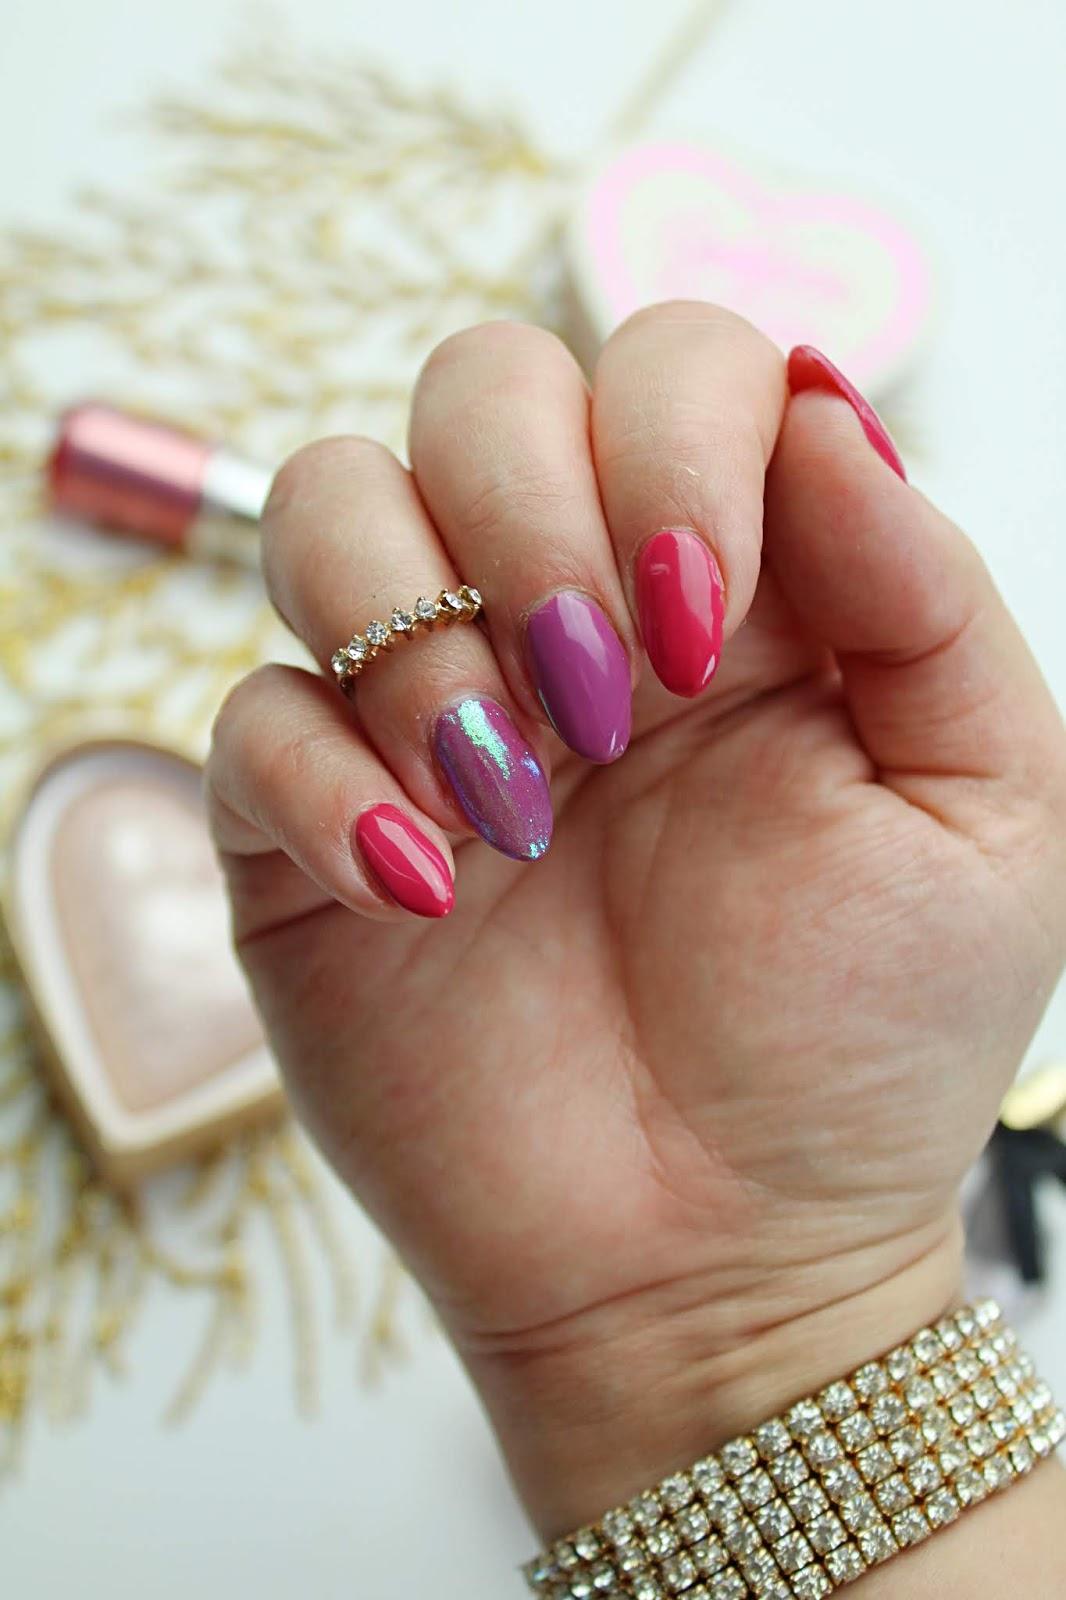 nails company success time mimi i celebrities